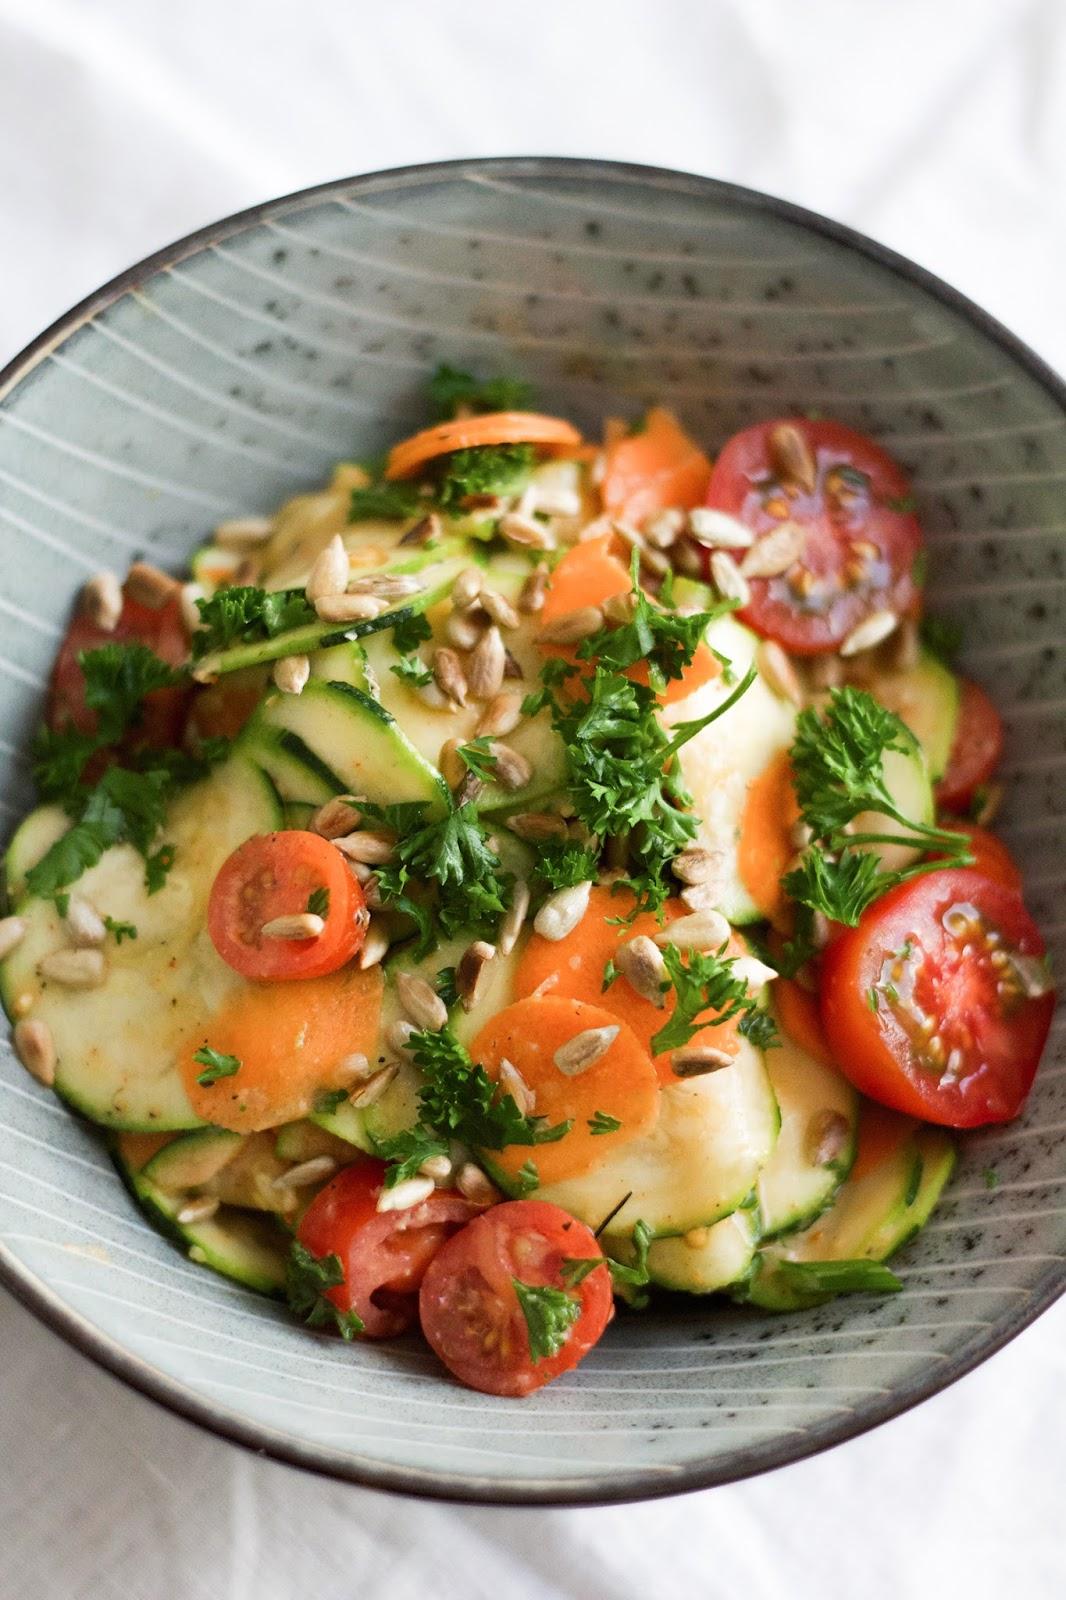 15 minuten rezept zucchini salat mit kr uter hummus dressing werbung feines gem se. Black Bedroom Furniture Sets. Home Design Ideas